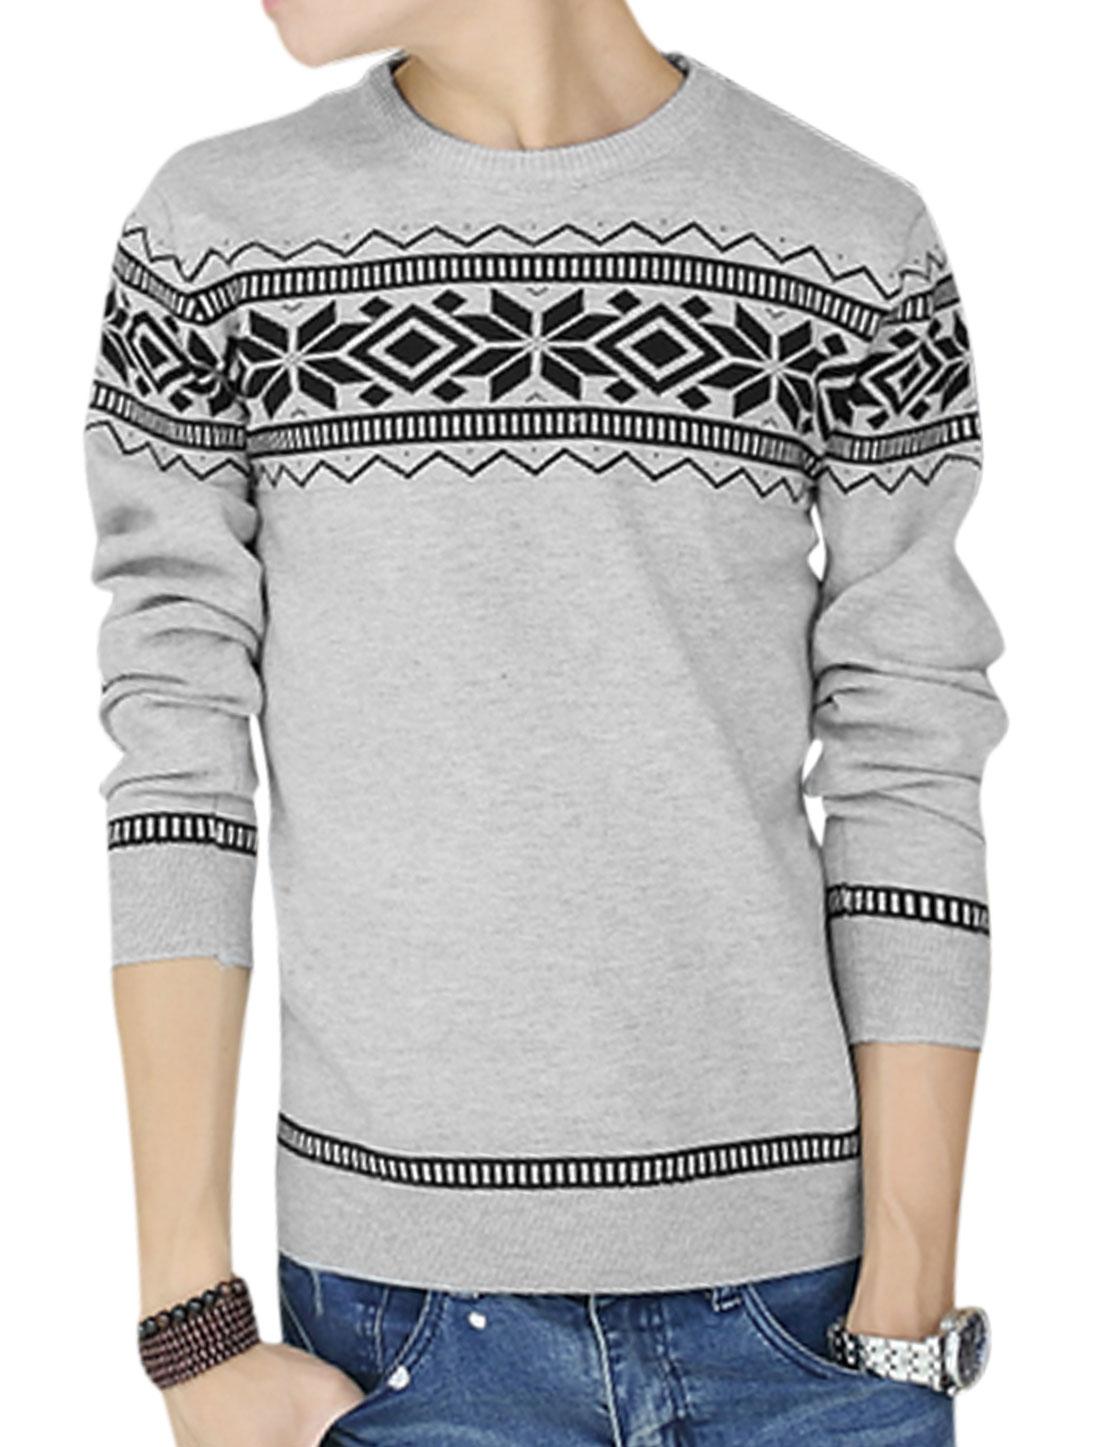 Men Gray Pullover Geometric Zigzag Prints Ribbed Trim Leisure Sweater M